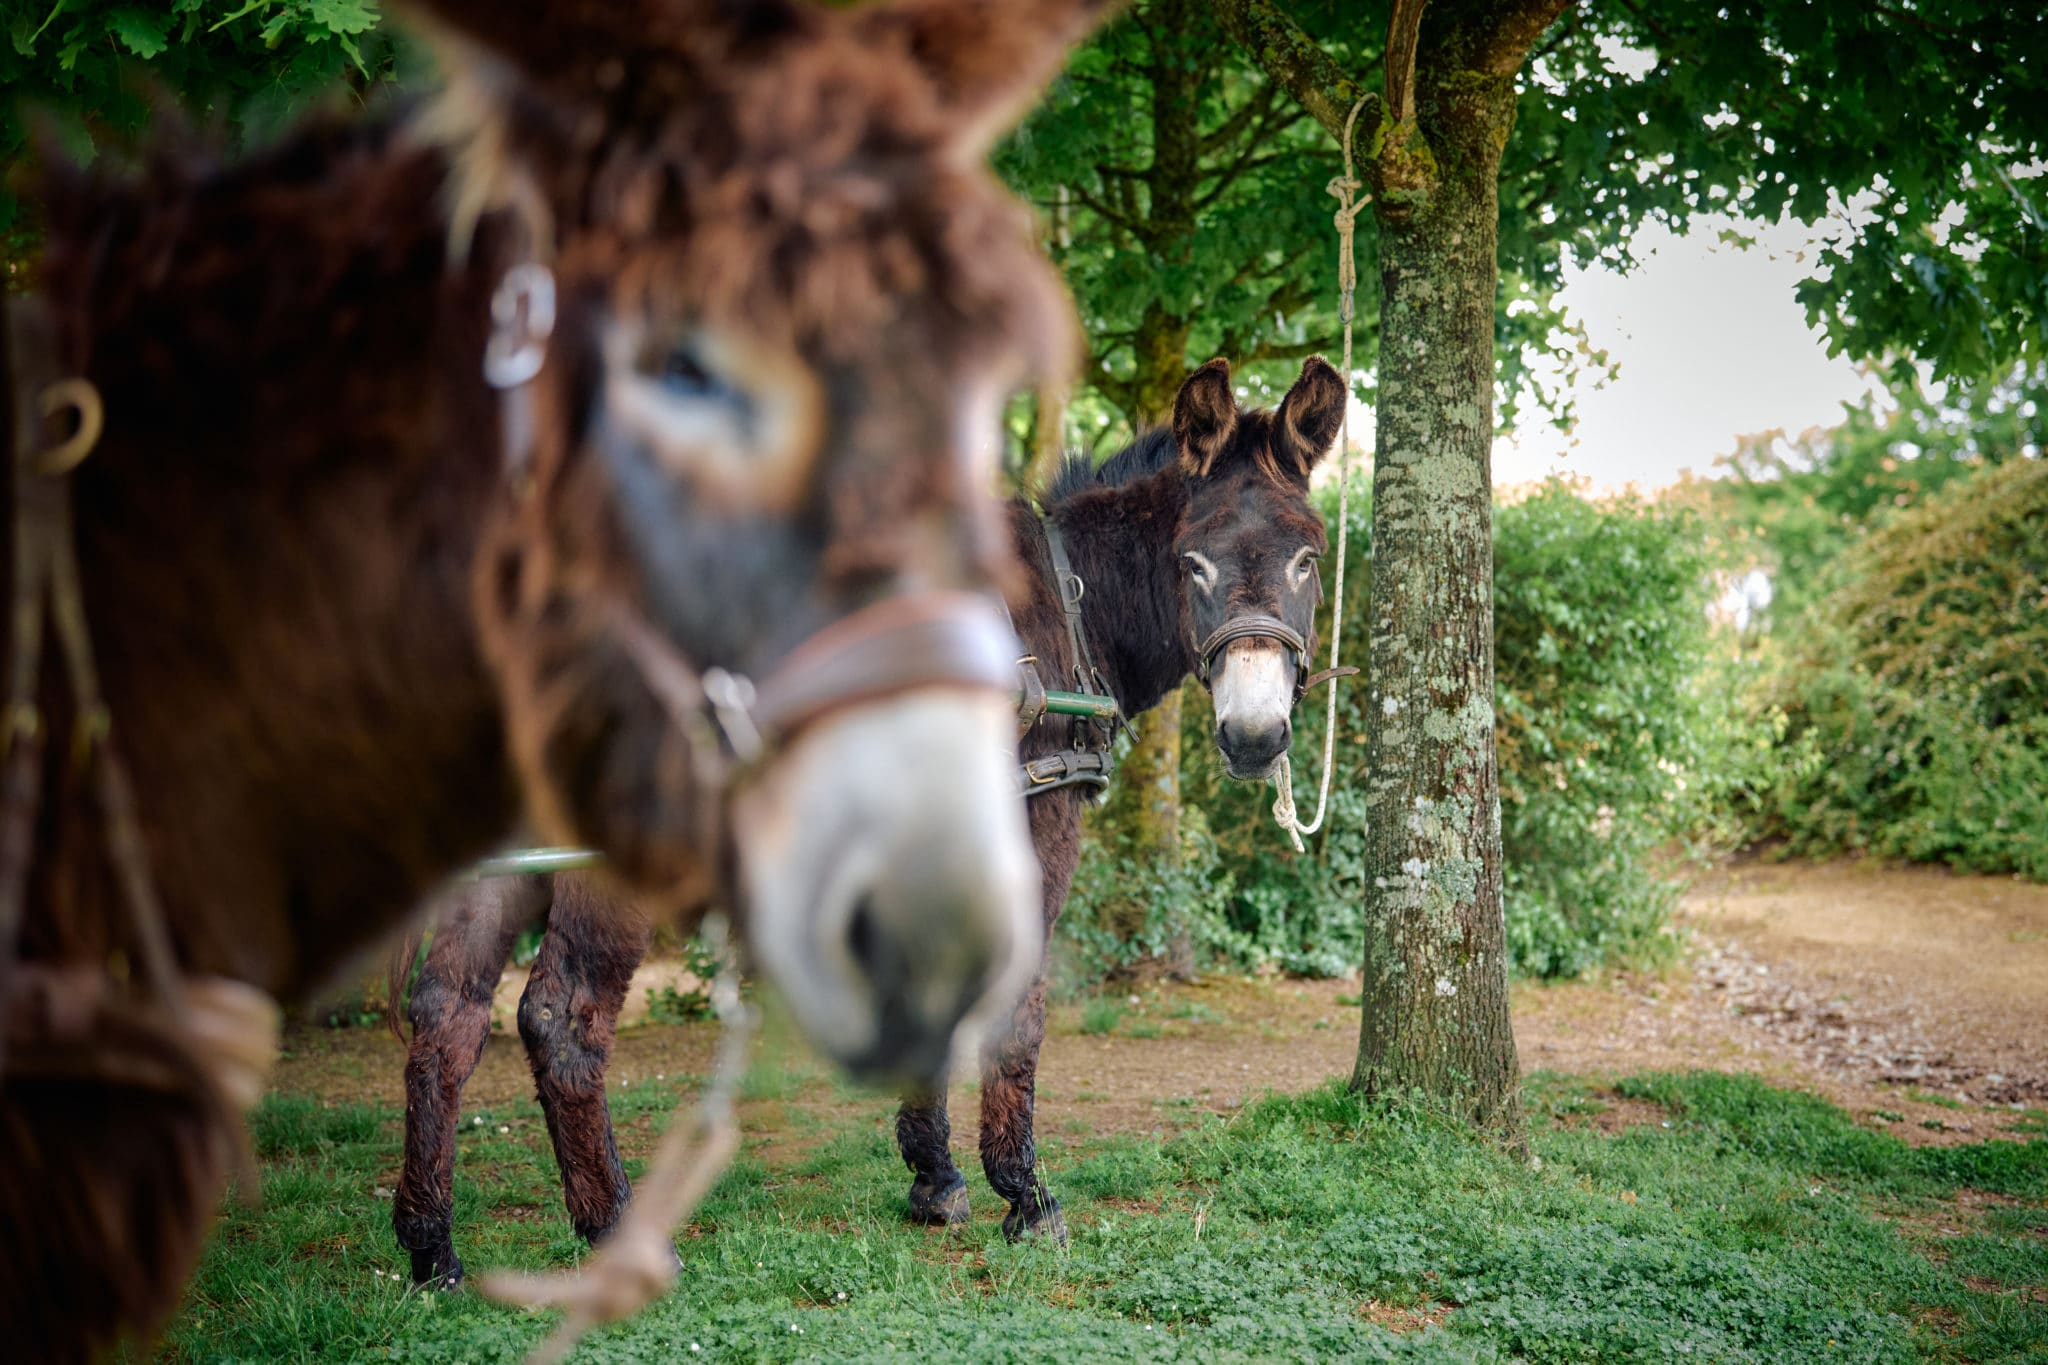 ânes Gaspard et Filou